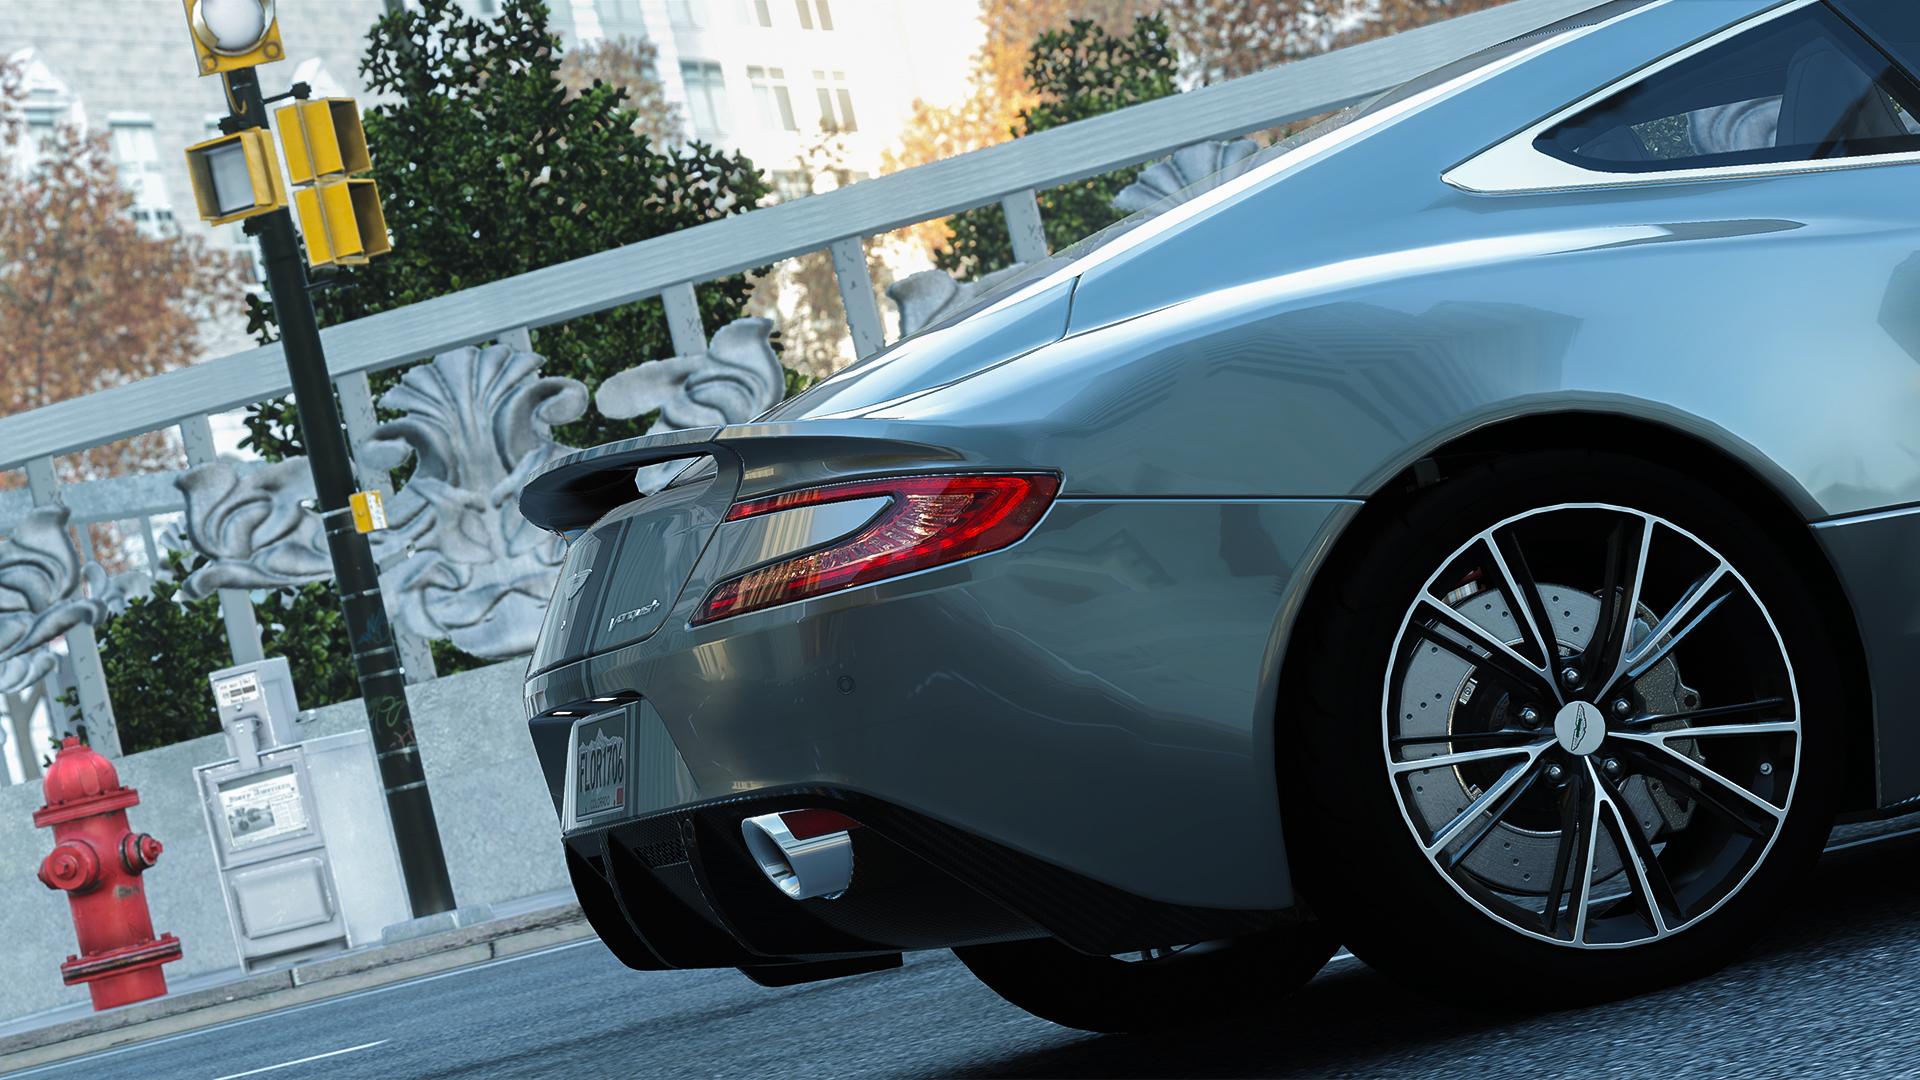 Wallpaper Video Games Forza Horizon 3 Forza Games Car Aston Martin 1920x1080 Etchasketch 1172009 Hd Wallpapers Wallhere